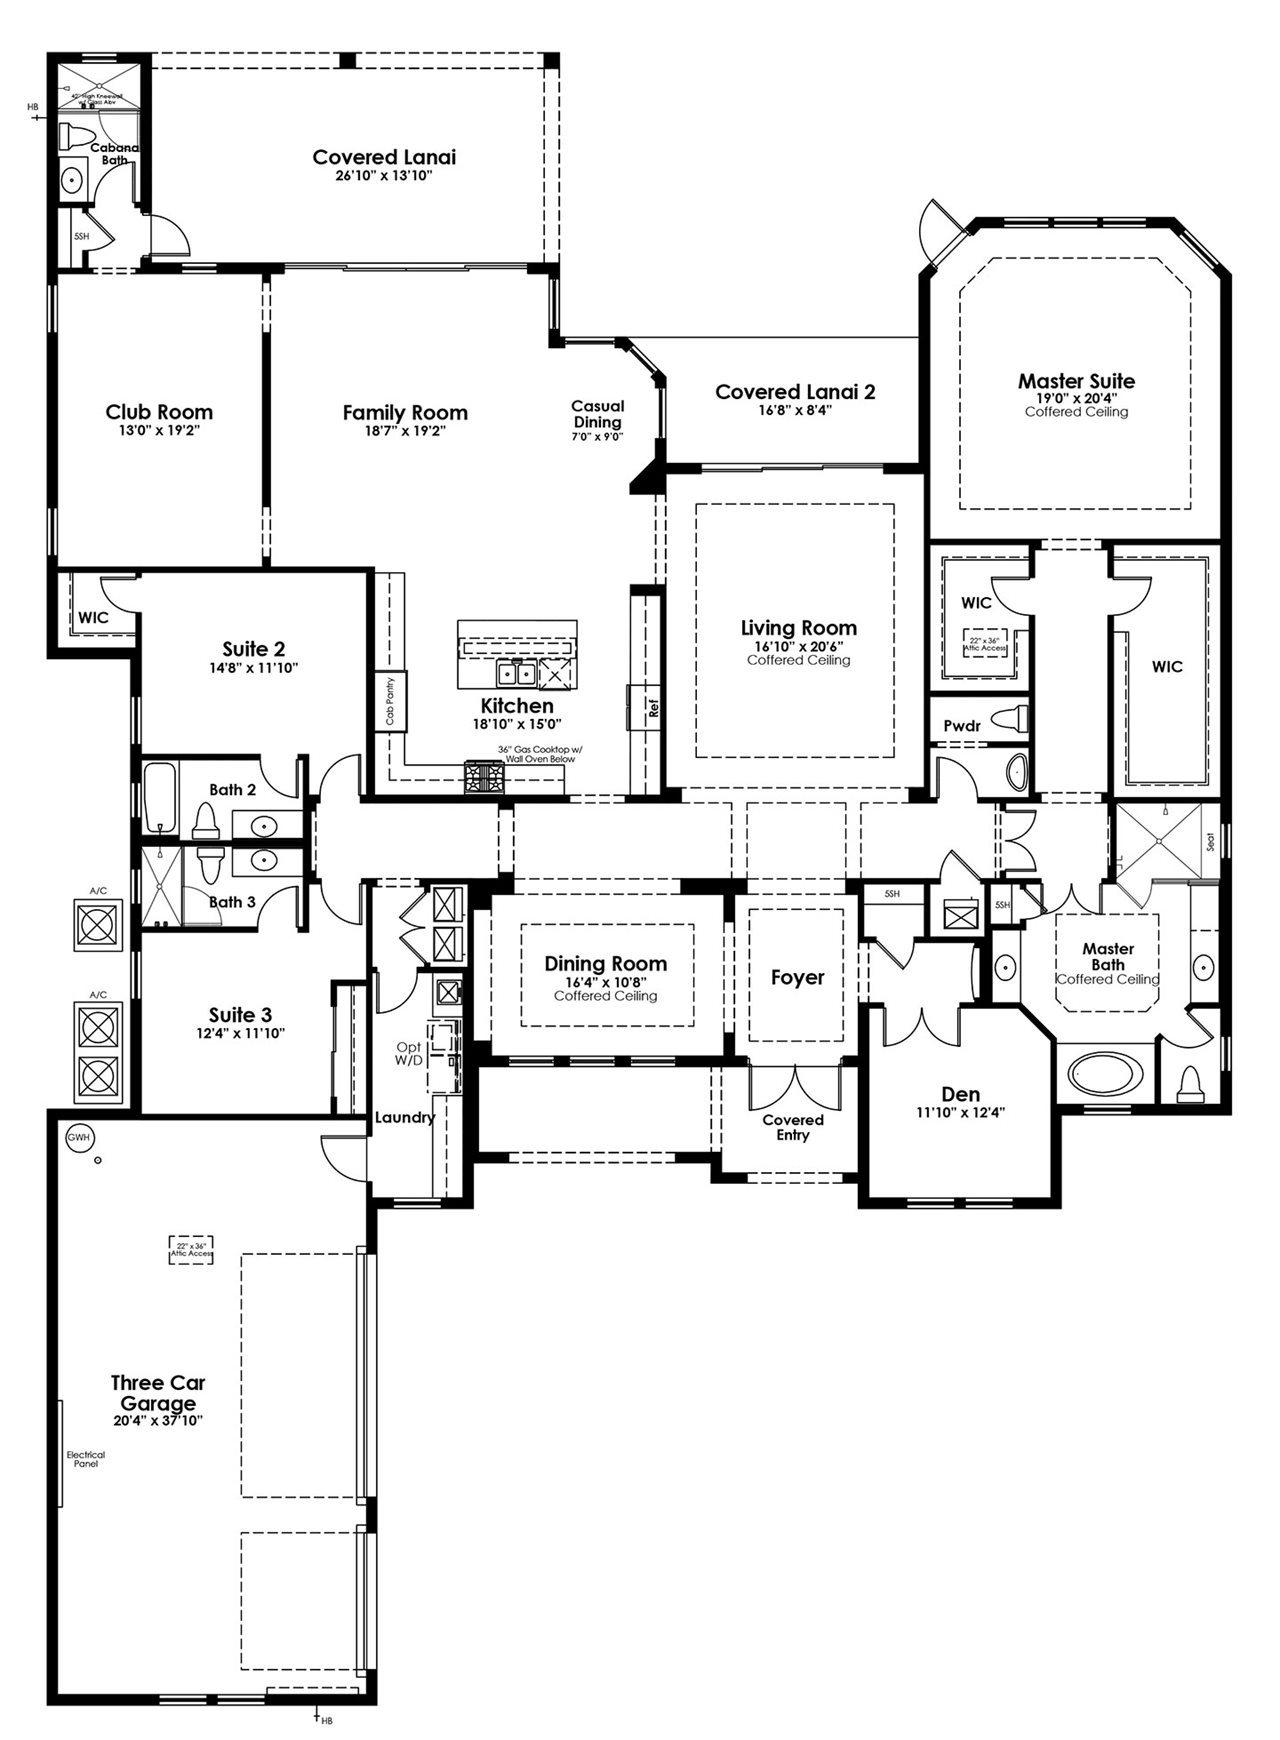 Martin Plan At Artistry Sarasota In Sarasota Fl By Kolter Homes